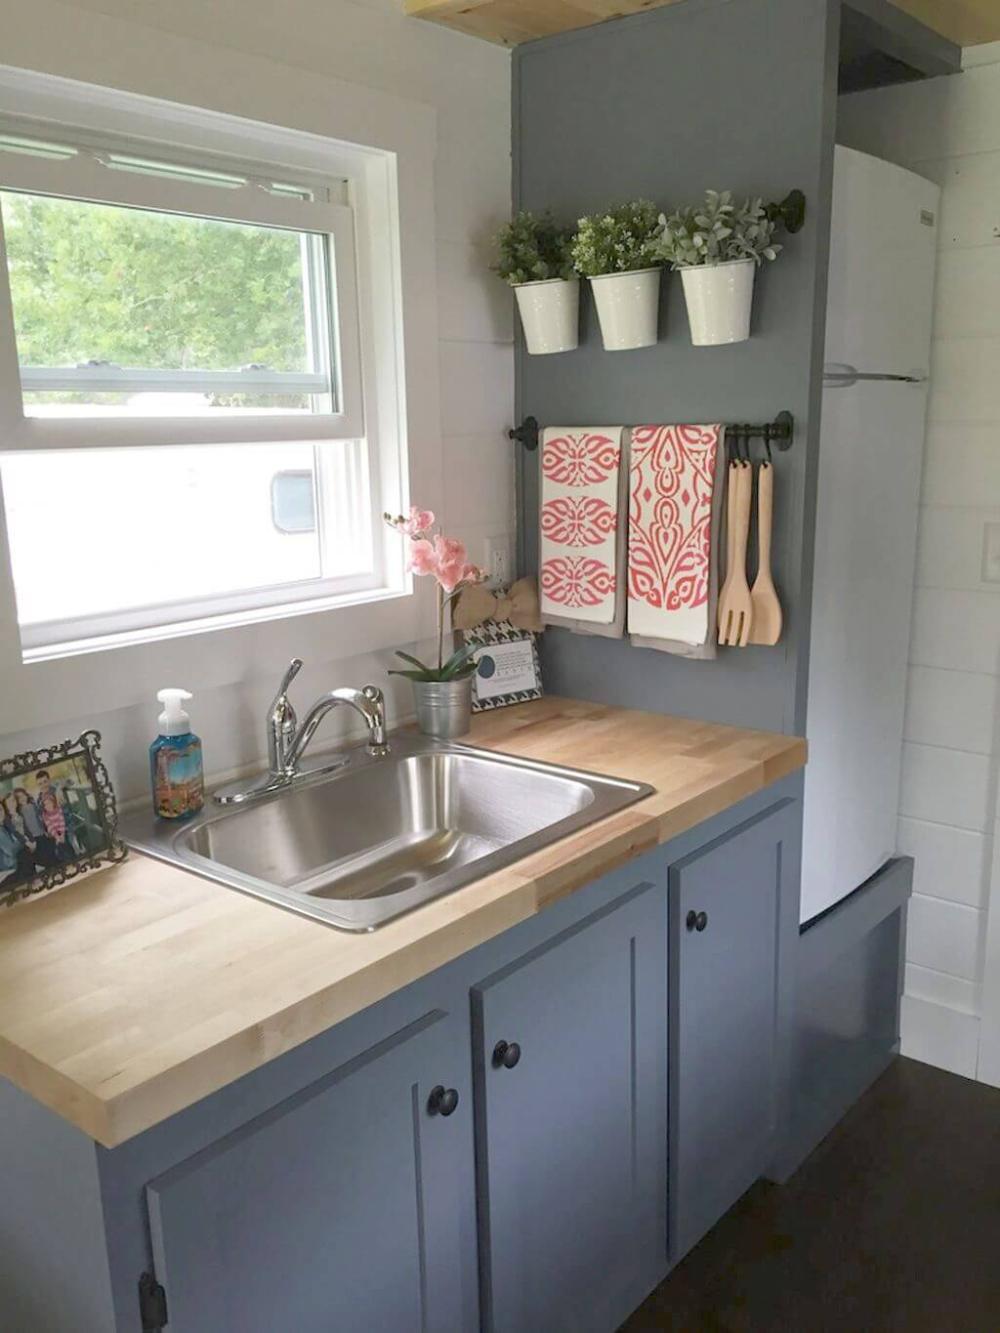 Small Kitchen Decorating Ideas Kitchen Remodel Small Small Kitchen Decor Kitchen Design Small